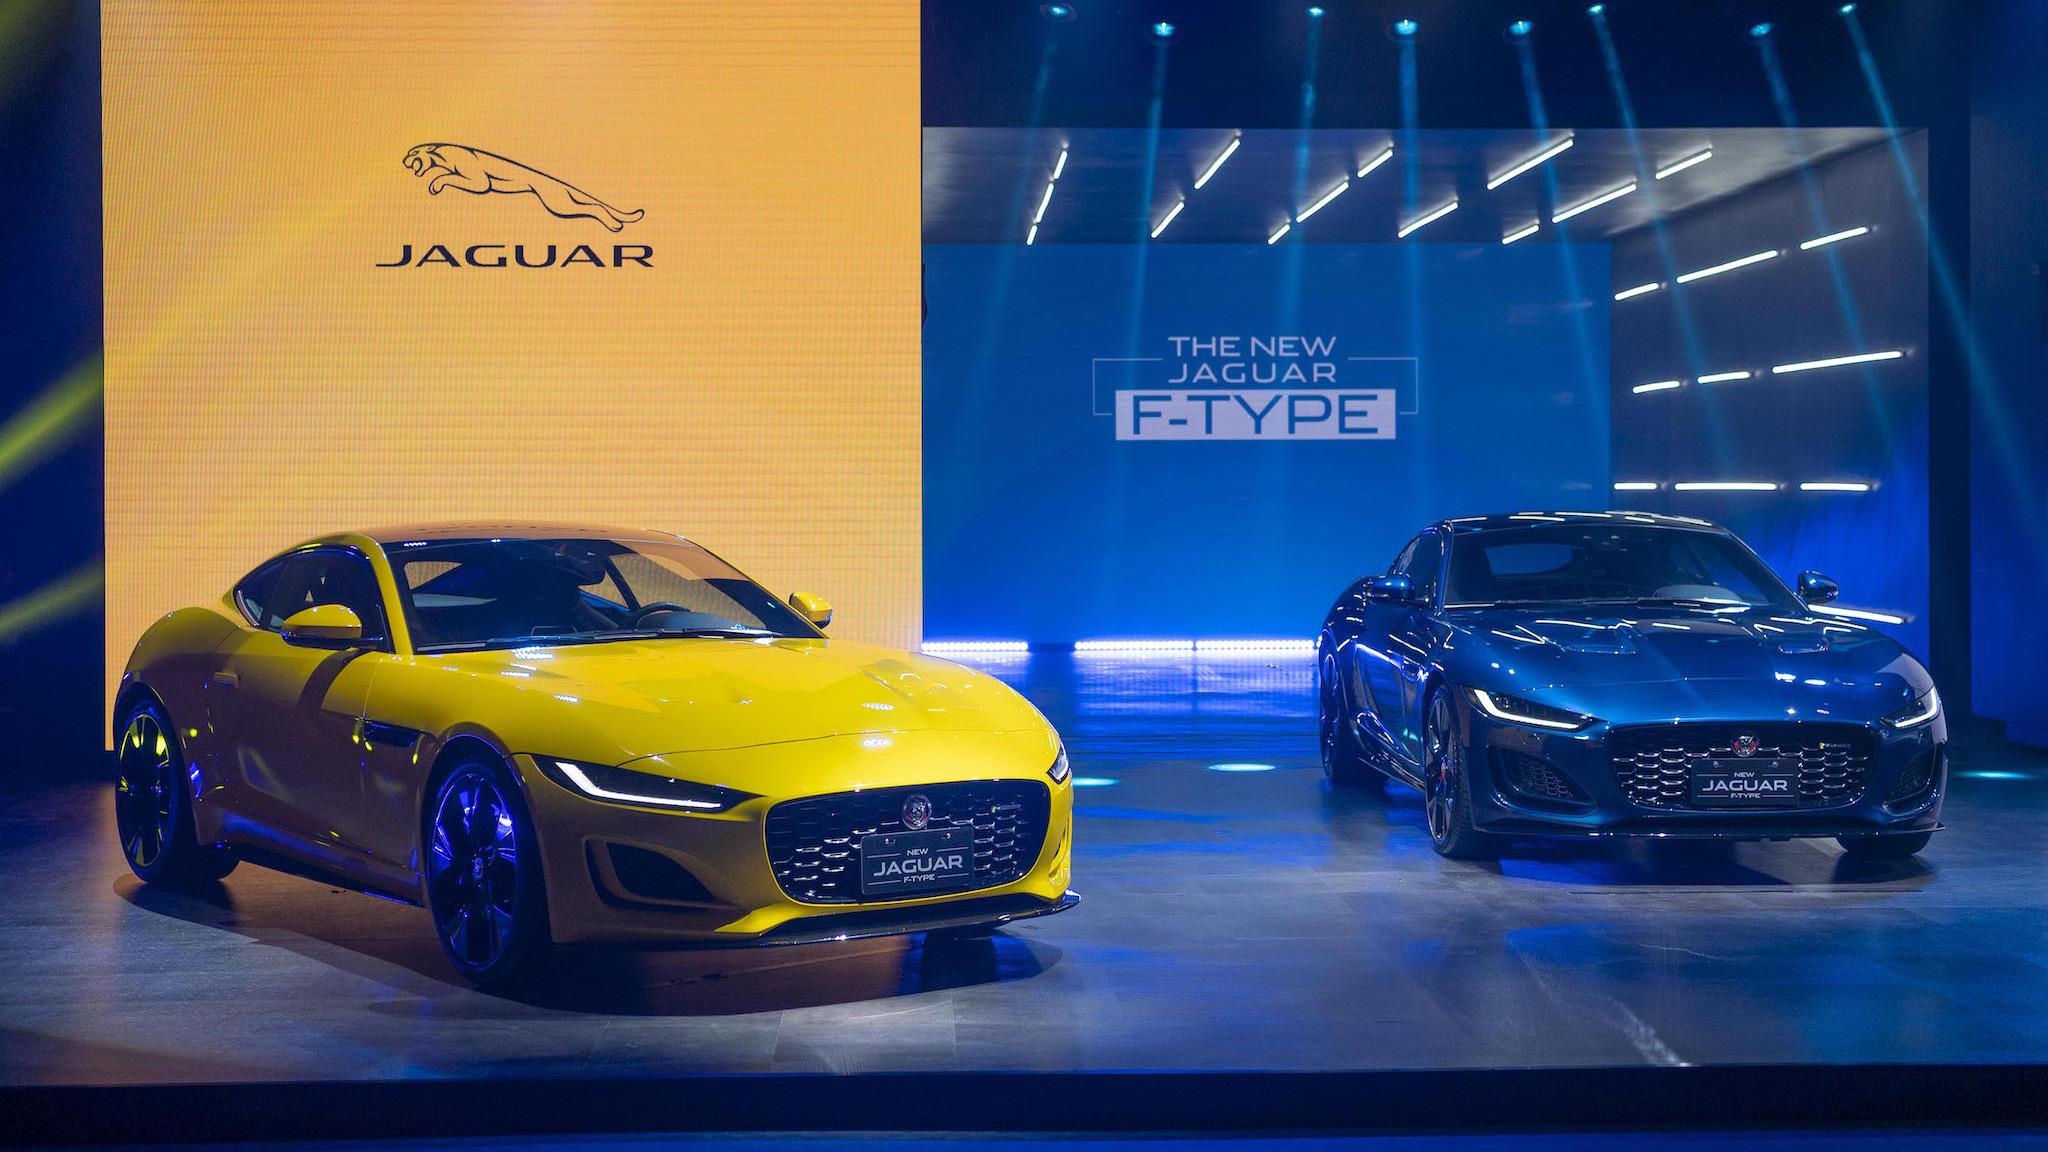 Jaguar F-Type 英倫雙座跑車 366 萬起正式登台